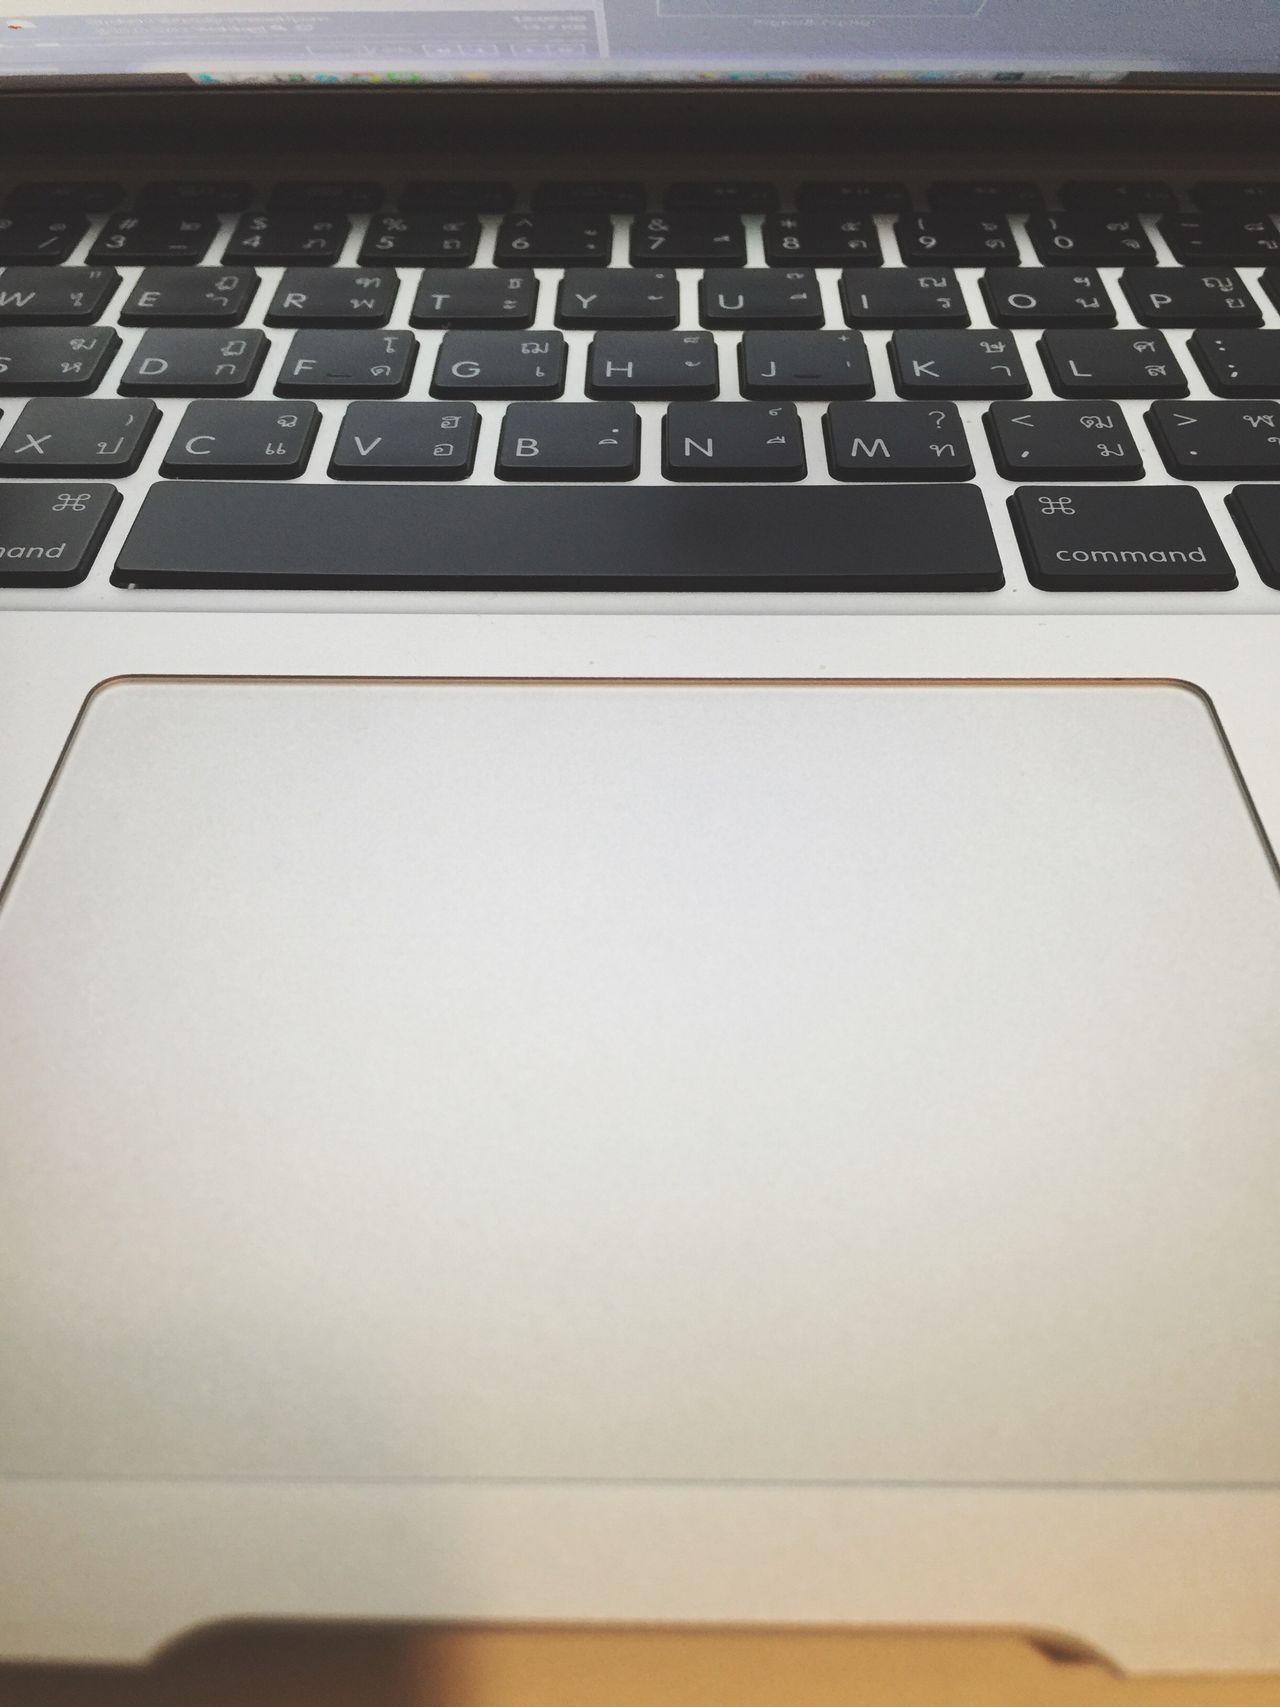 Beautiful stock photos of tastatur, technology, computer keyboard, no people, close-up